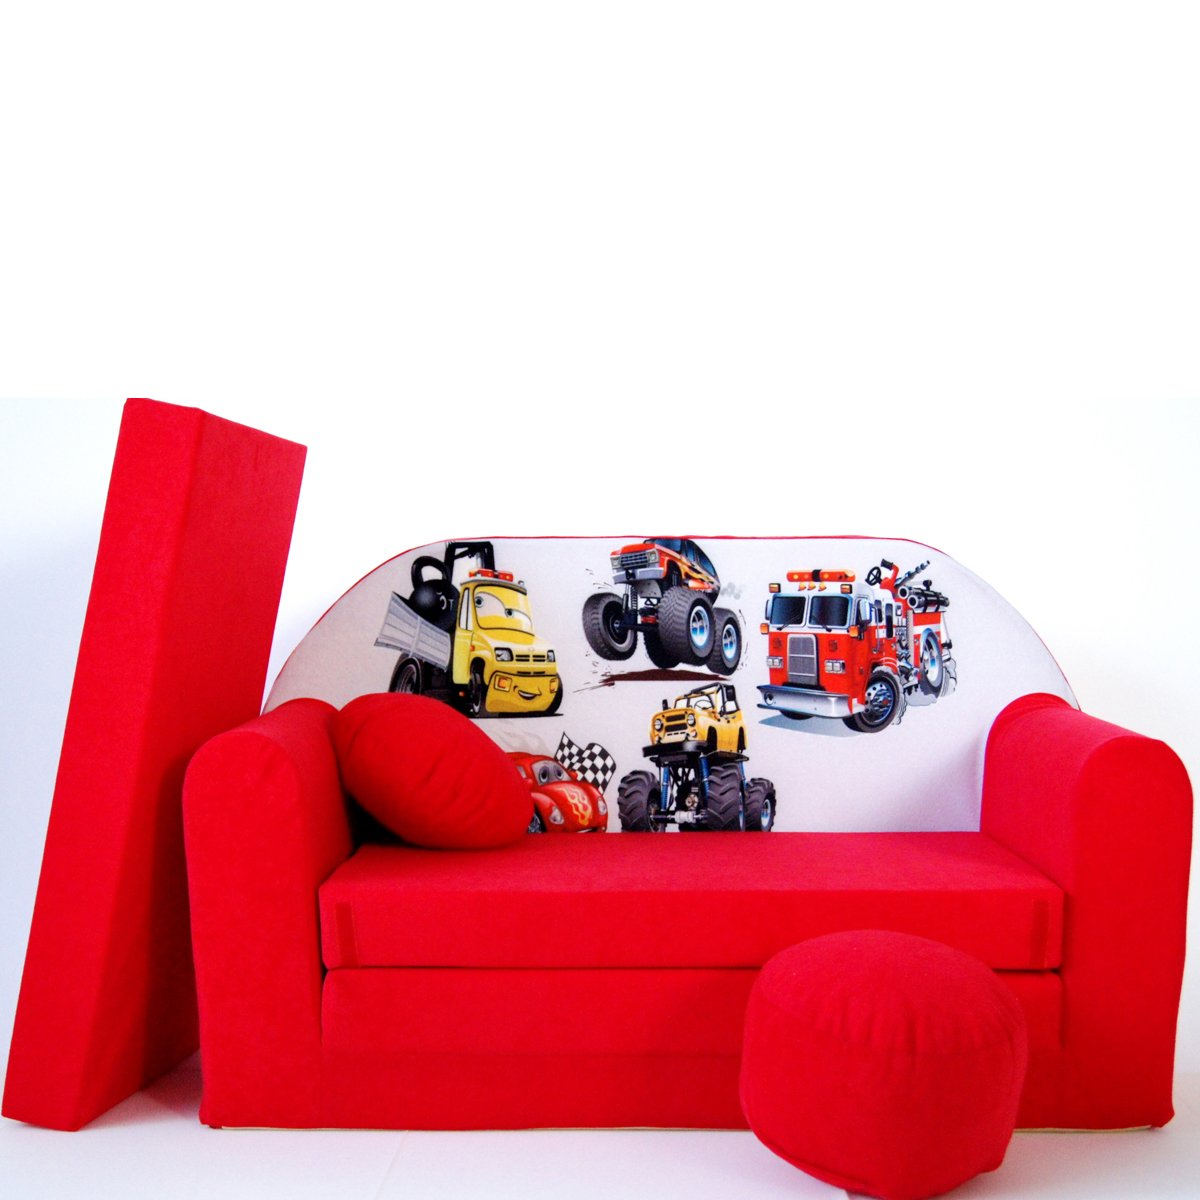 oferta de tienda barabike Kindermouml;bel Kindermouml;bel Kindermouml;bel D14 Niños Bar Dormir emergente sofá sofá sofá Mini sofá 3 en 1 Baby Set + – Sillón Infantil y Asiento cojín + colchón  Web oficial